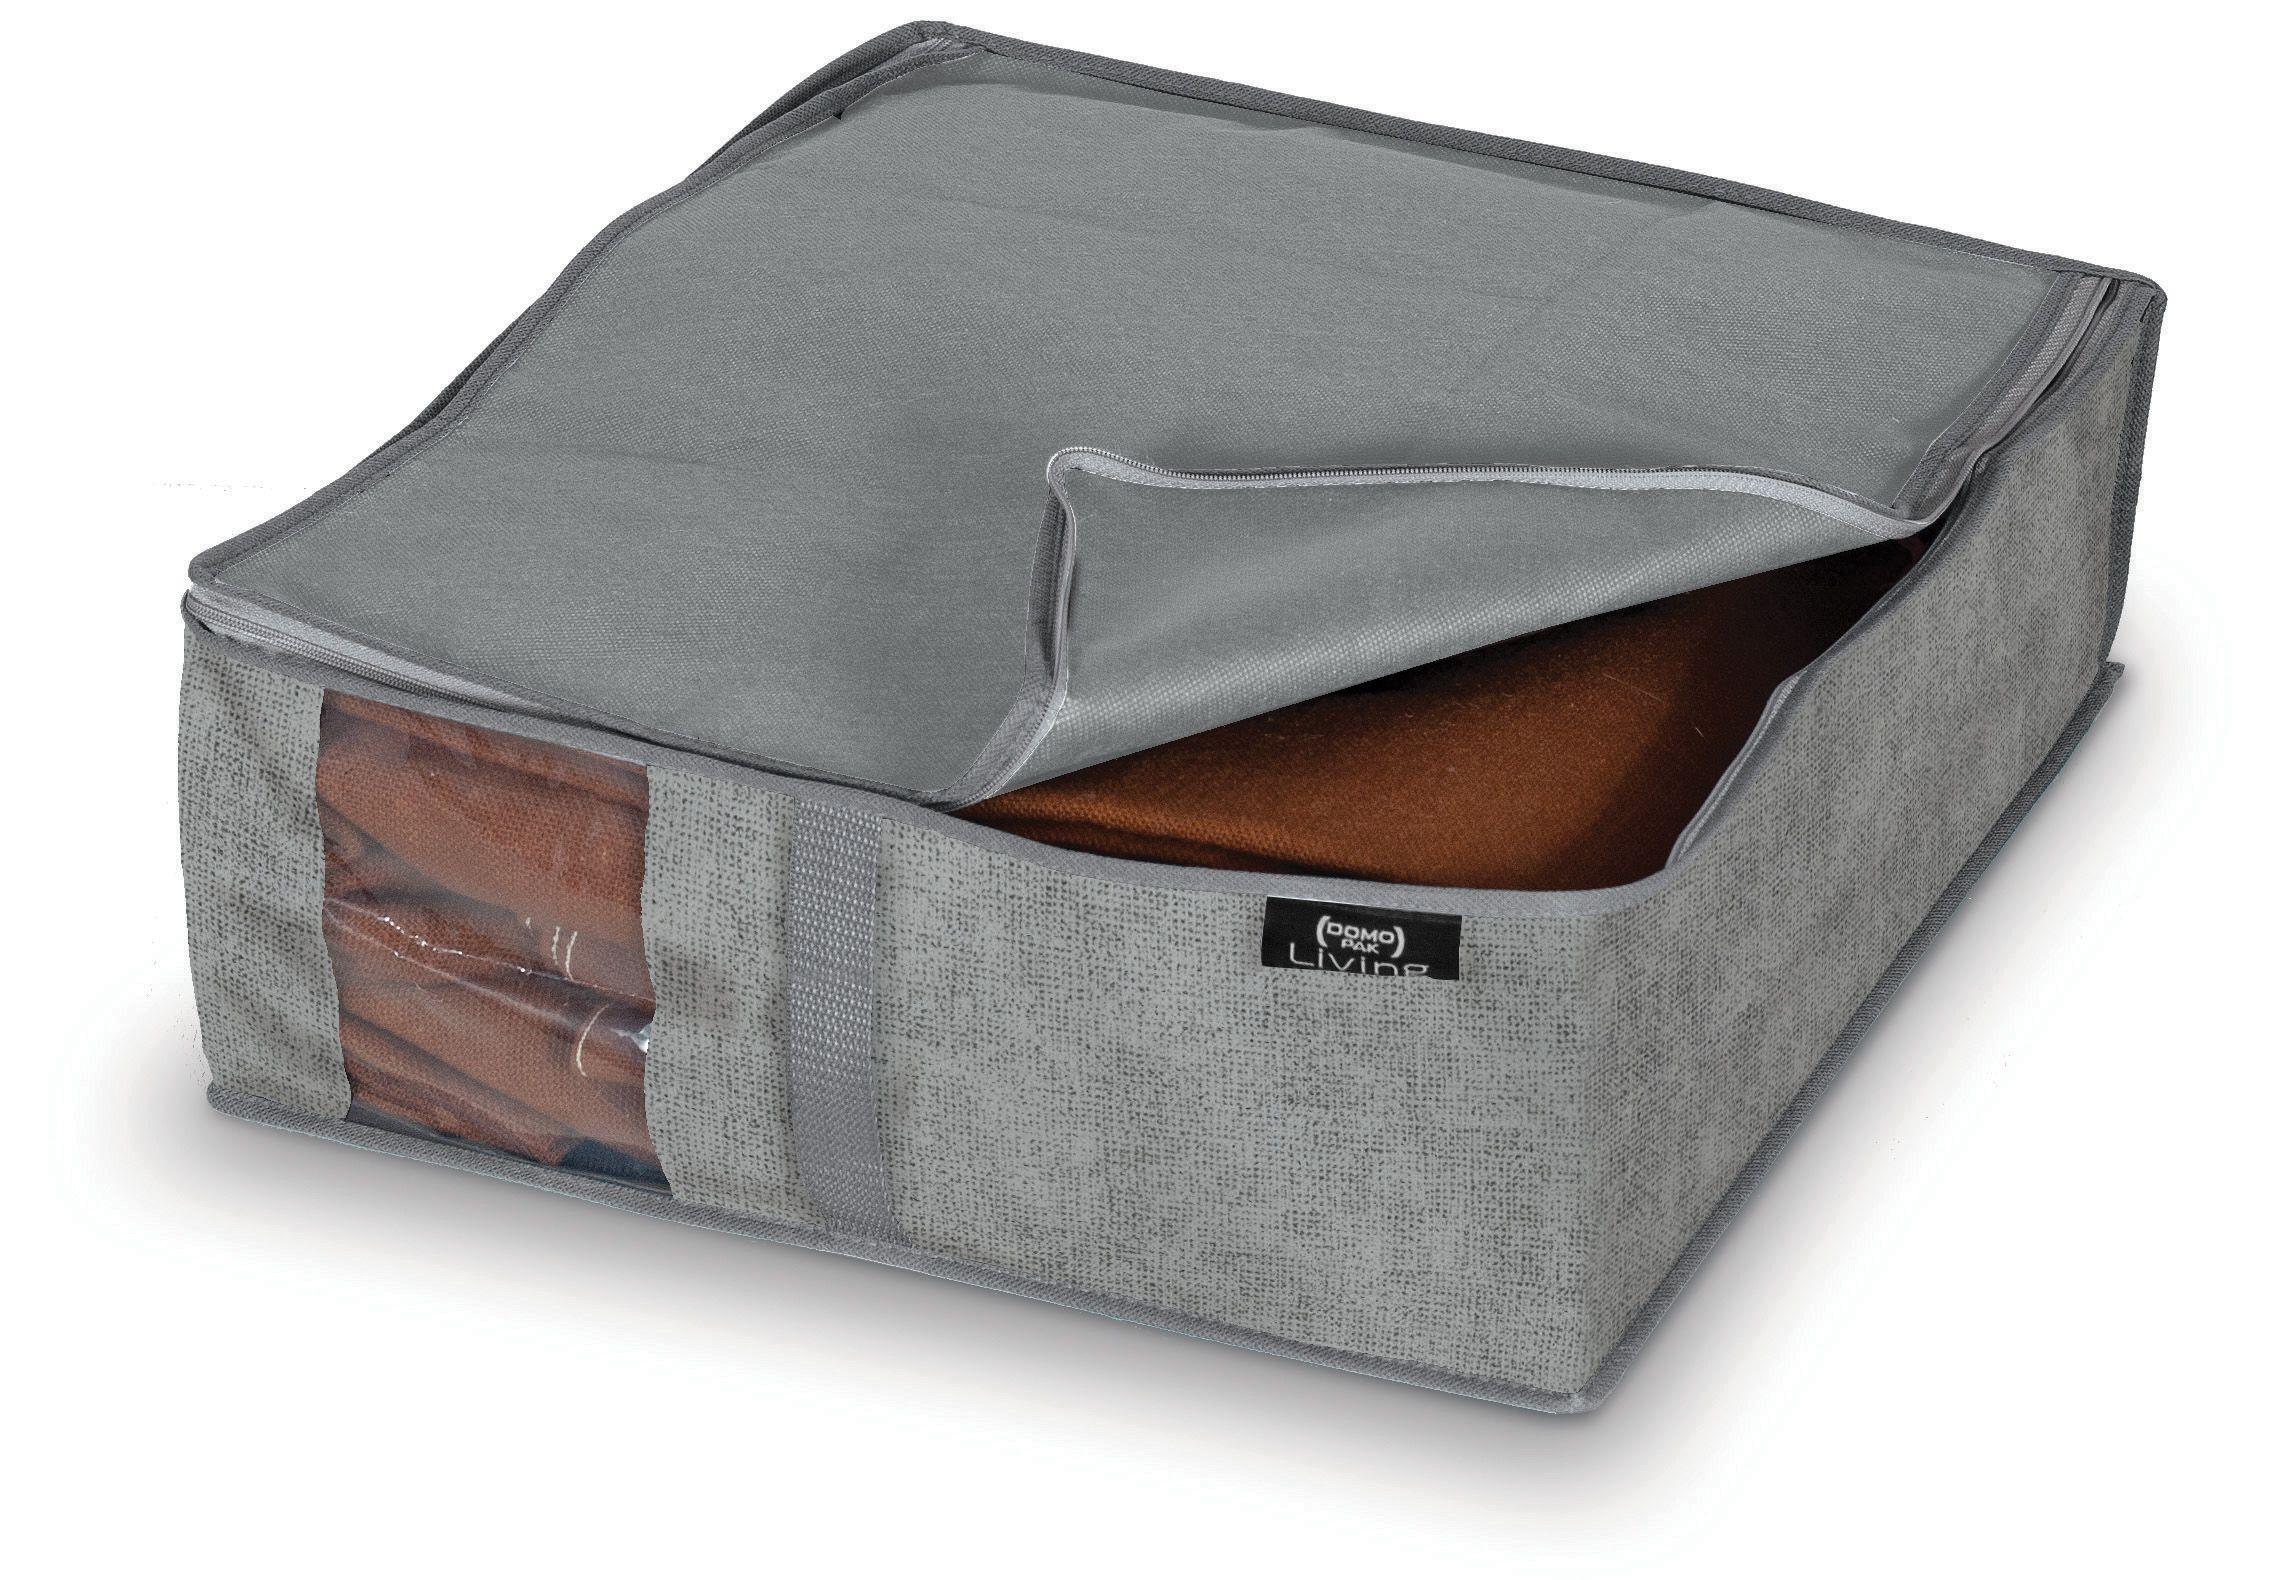 Organizator textil pliabil cu fermoar, Stone Gri, L45xl40xH15 cm poza